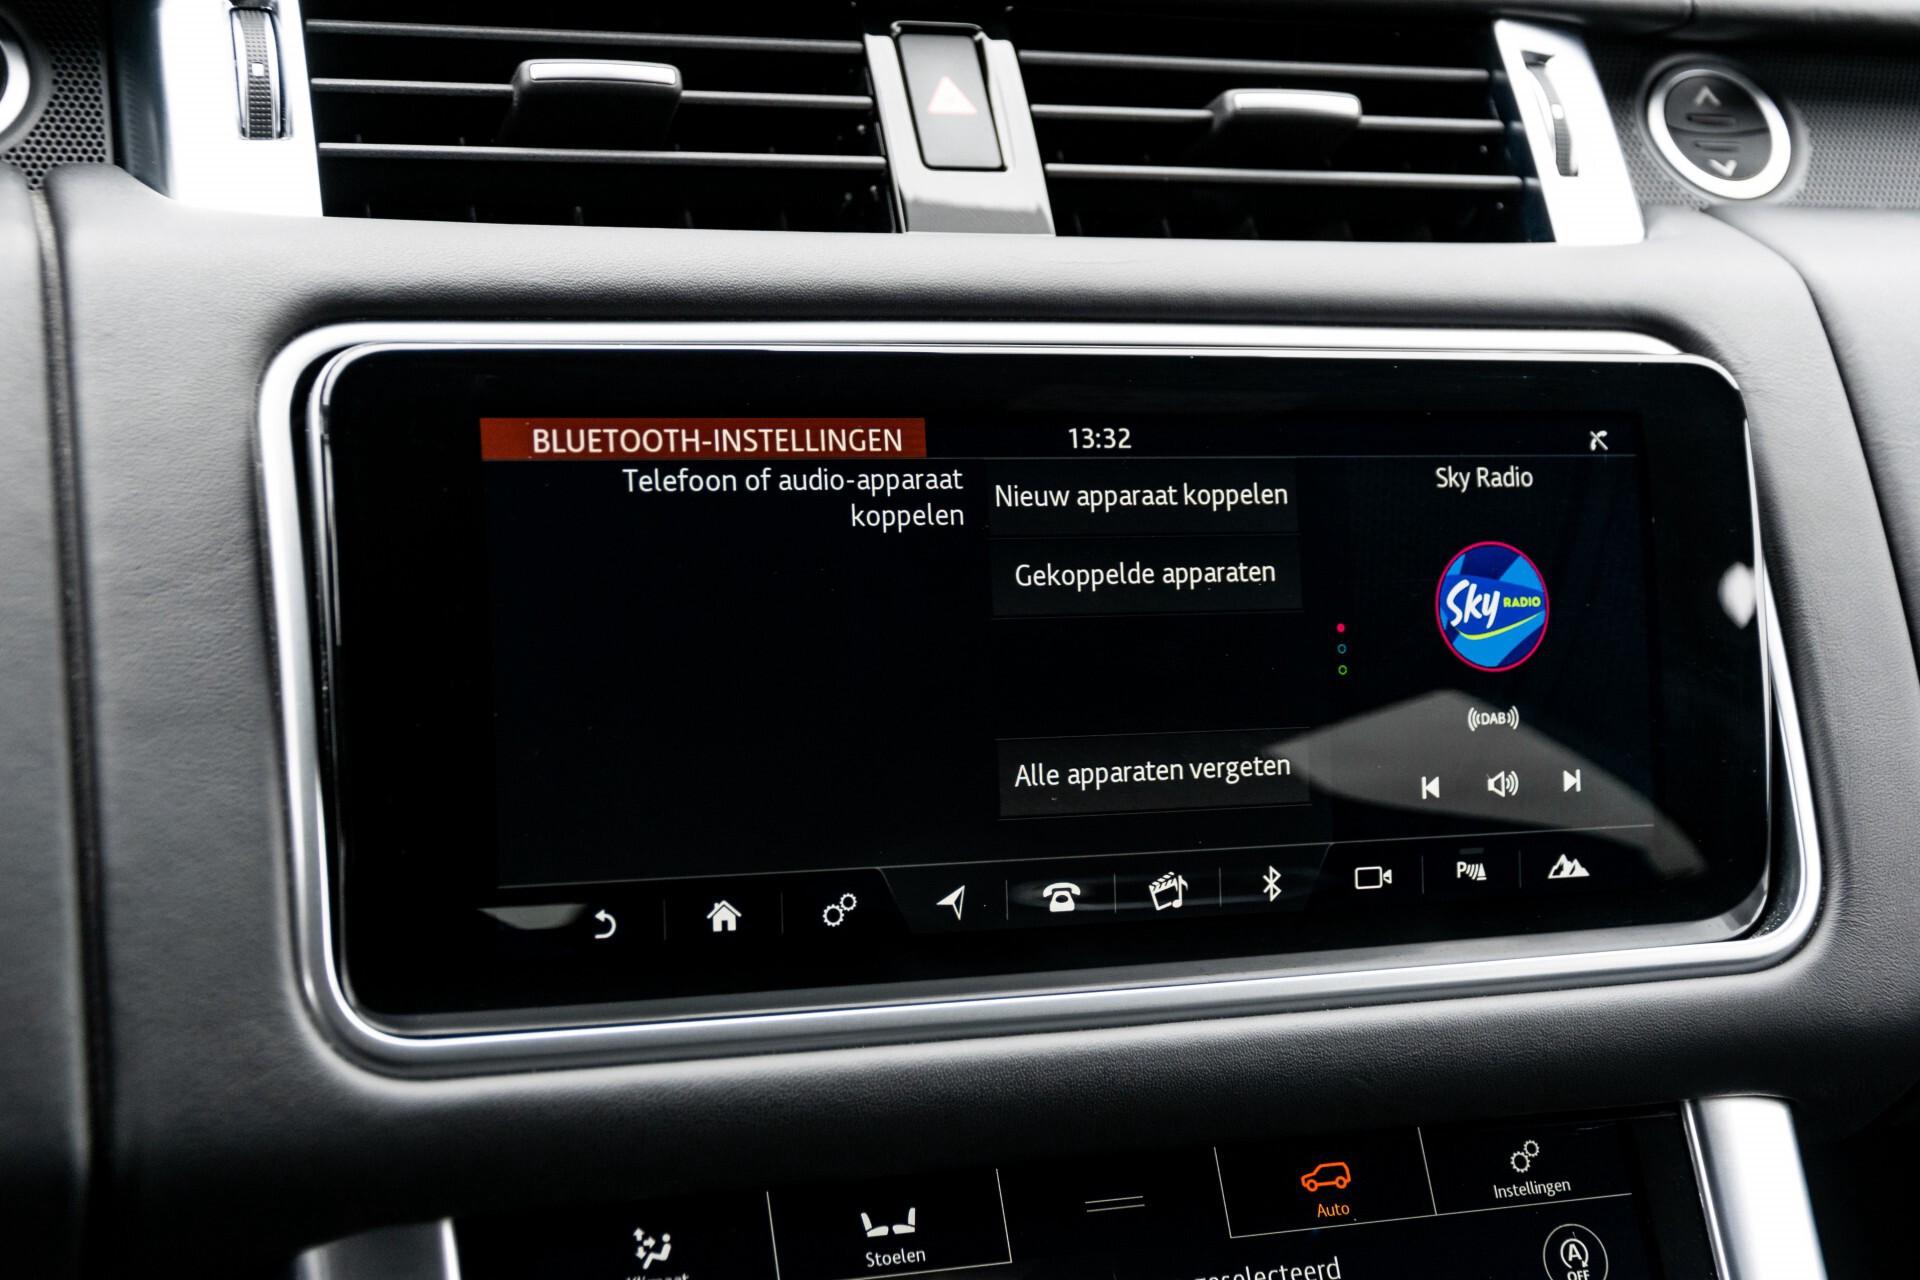 Land Rover Range Rover Sport SVR 5.0 Supercharged 575pk Full Carbon Nieuwprijs €241377 Foto 20